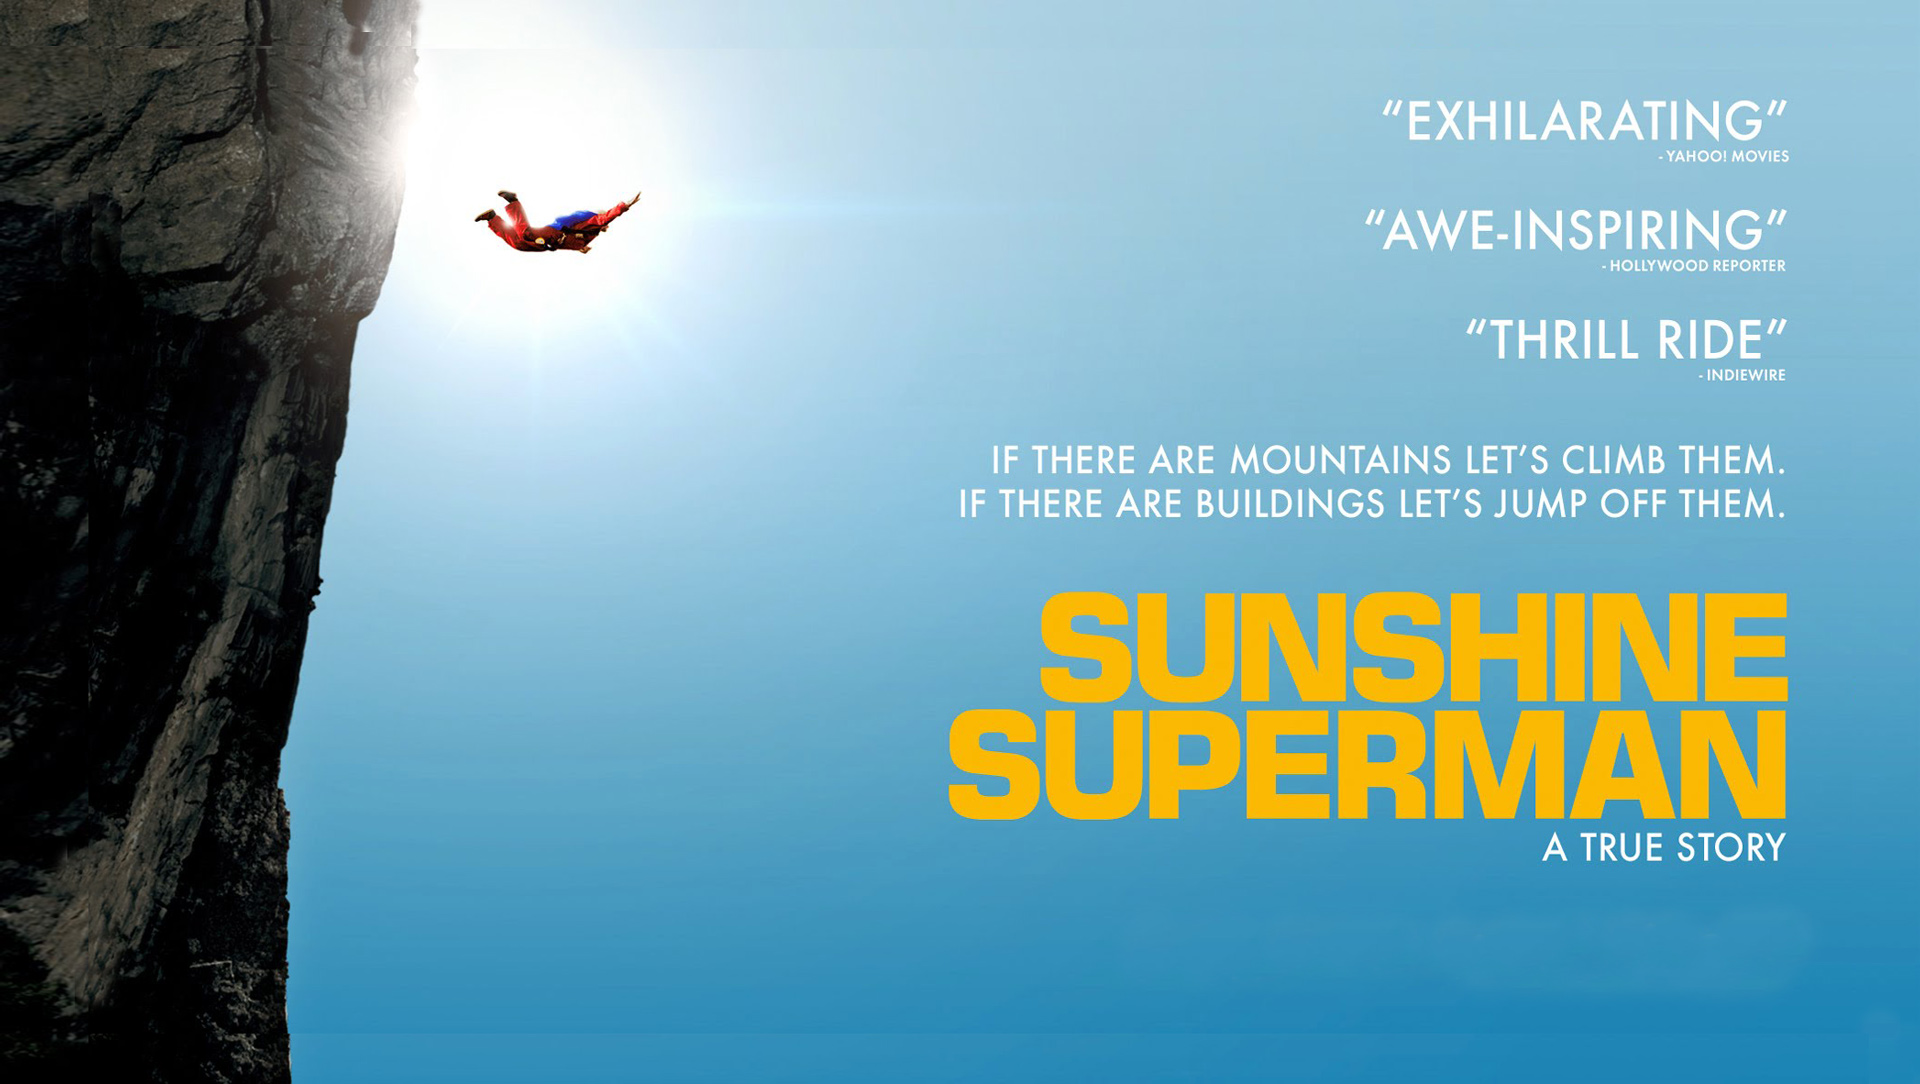 Prime-Elements-Carl-Boenish-Sunshine-Superman-03